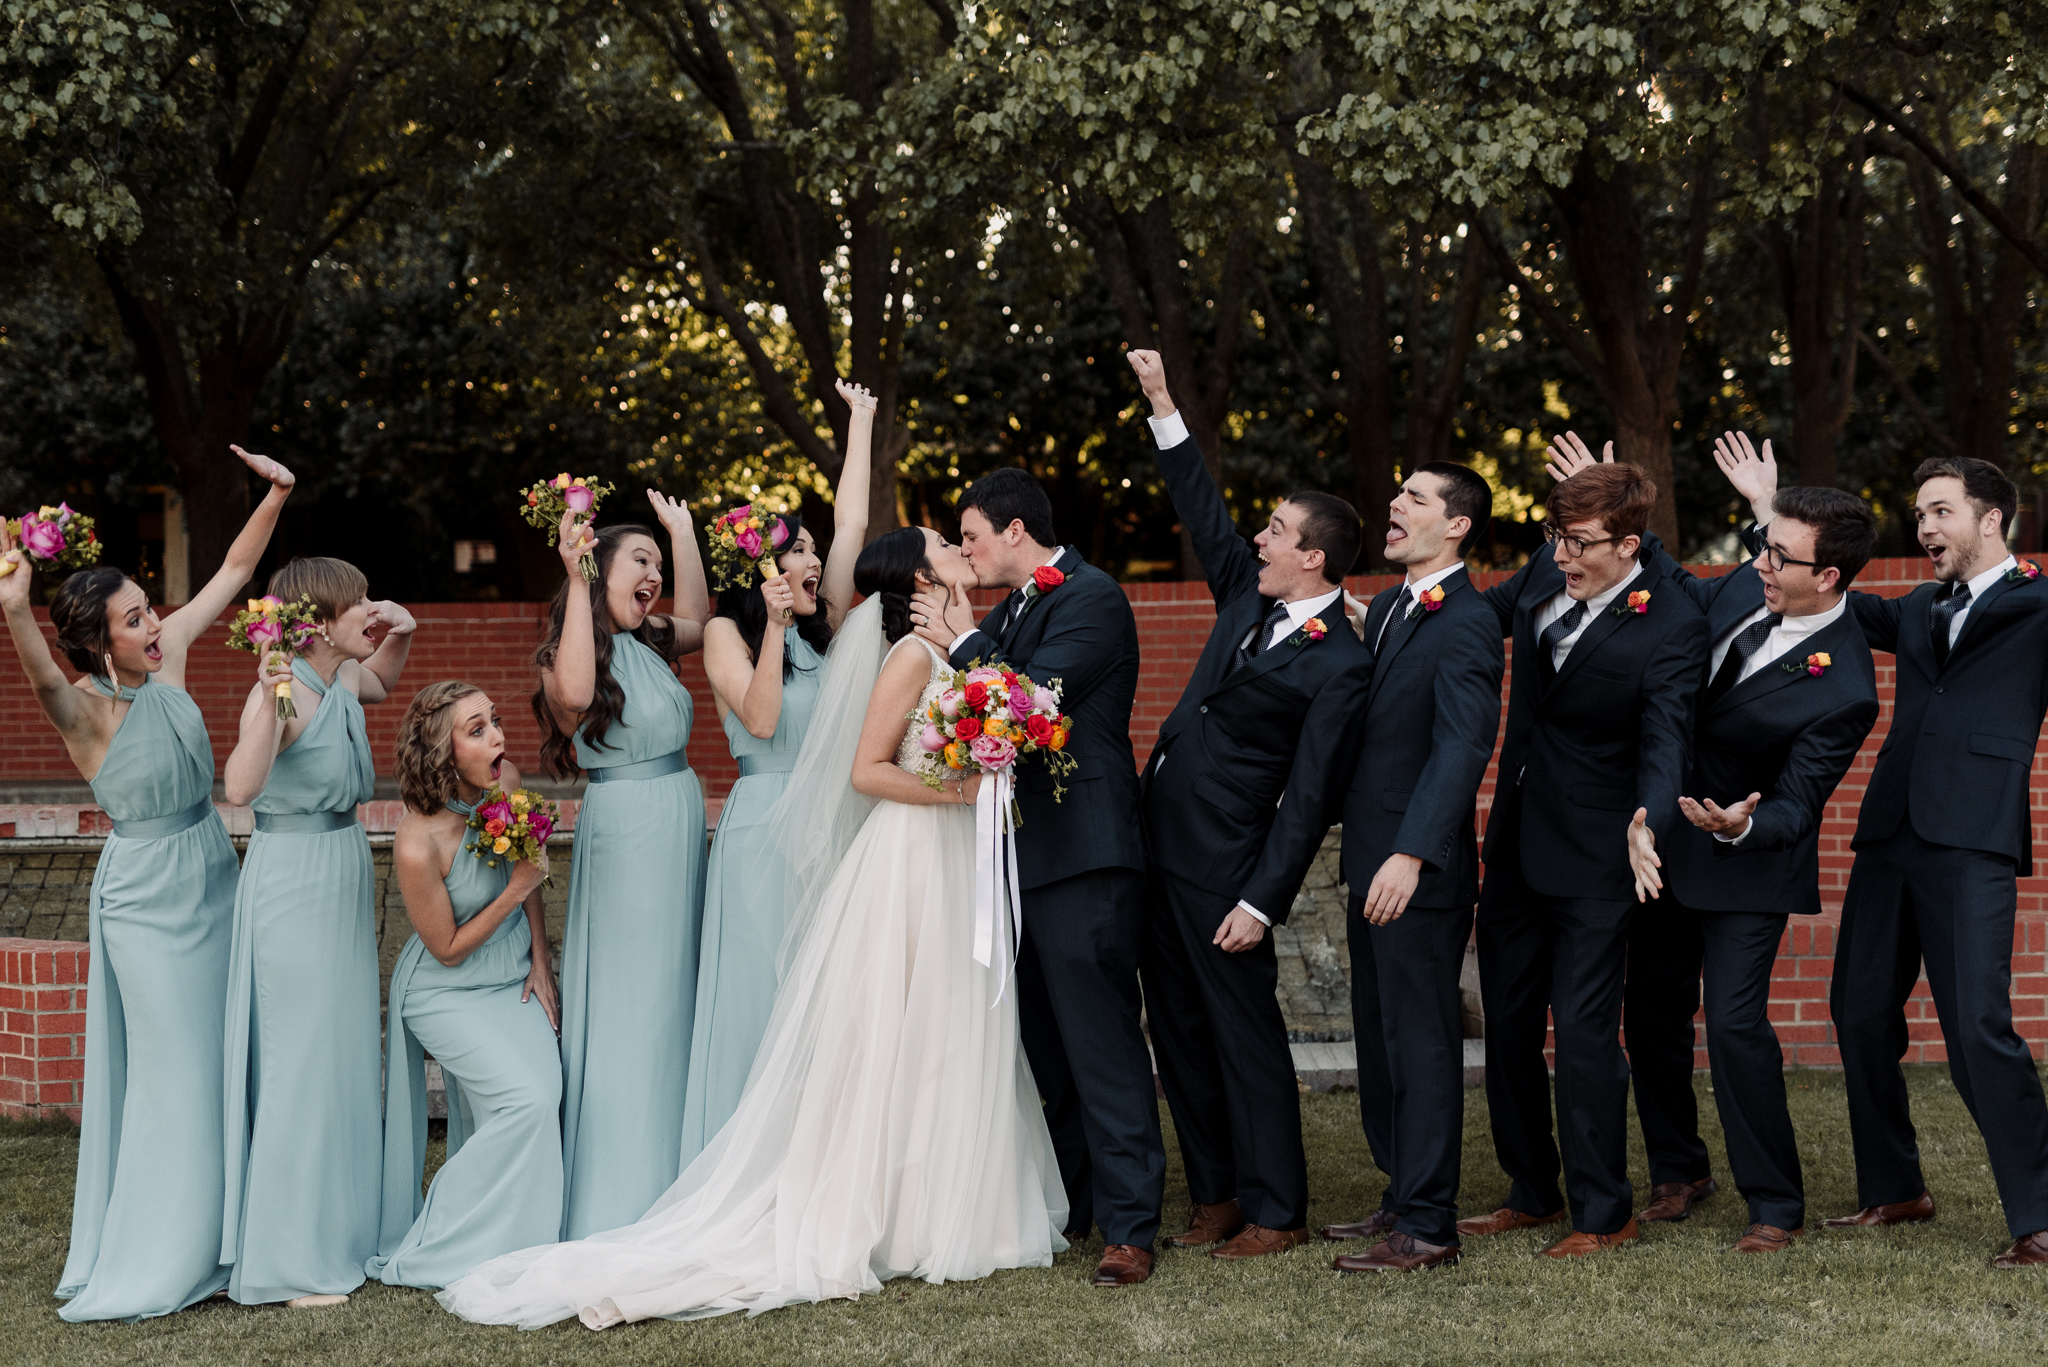 Oklahoma-Christian-University-Wedding-8527.jpg